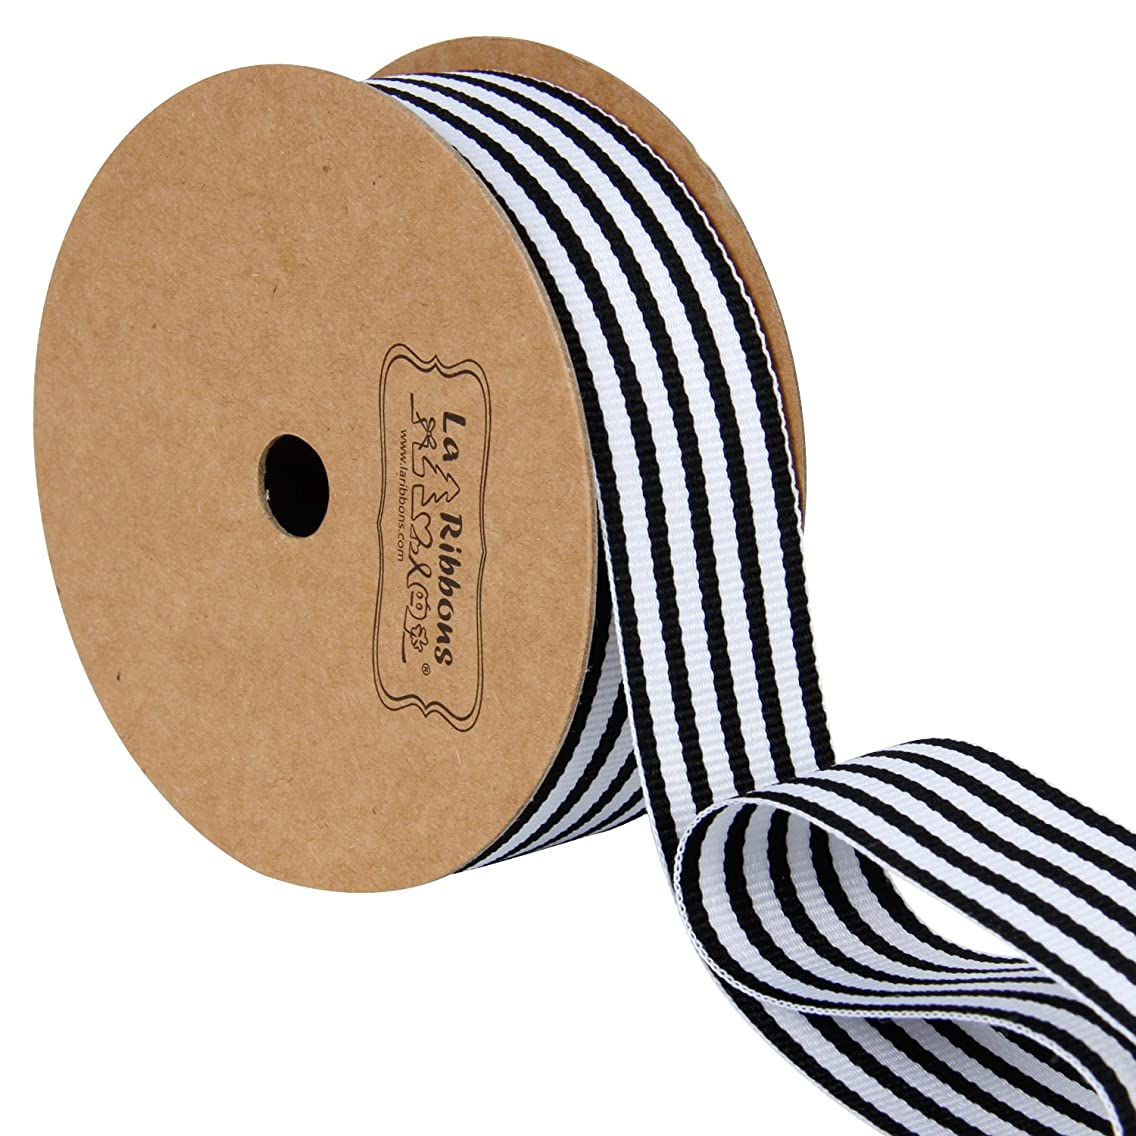 LaRibbons Black and White Striped Grosgrain Ribbon/Gift Wrap Ribbon, 1 Inch by 10 Yard/Spool